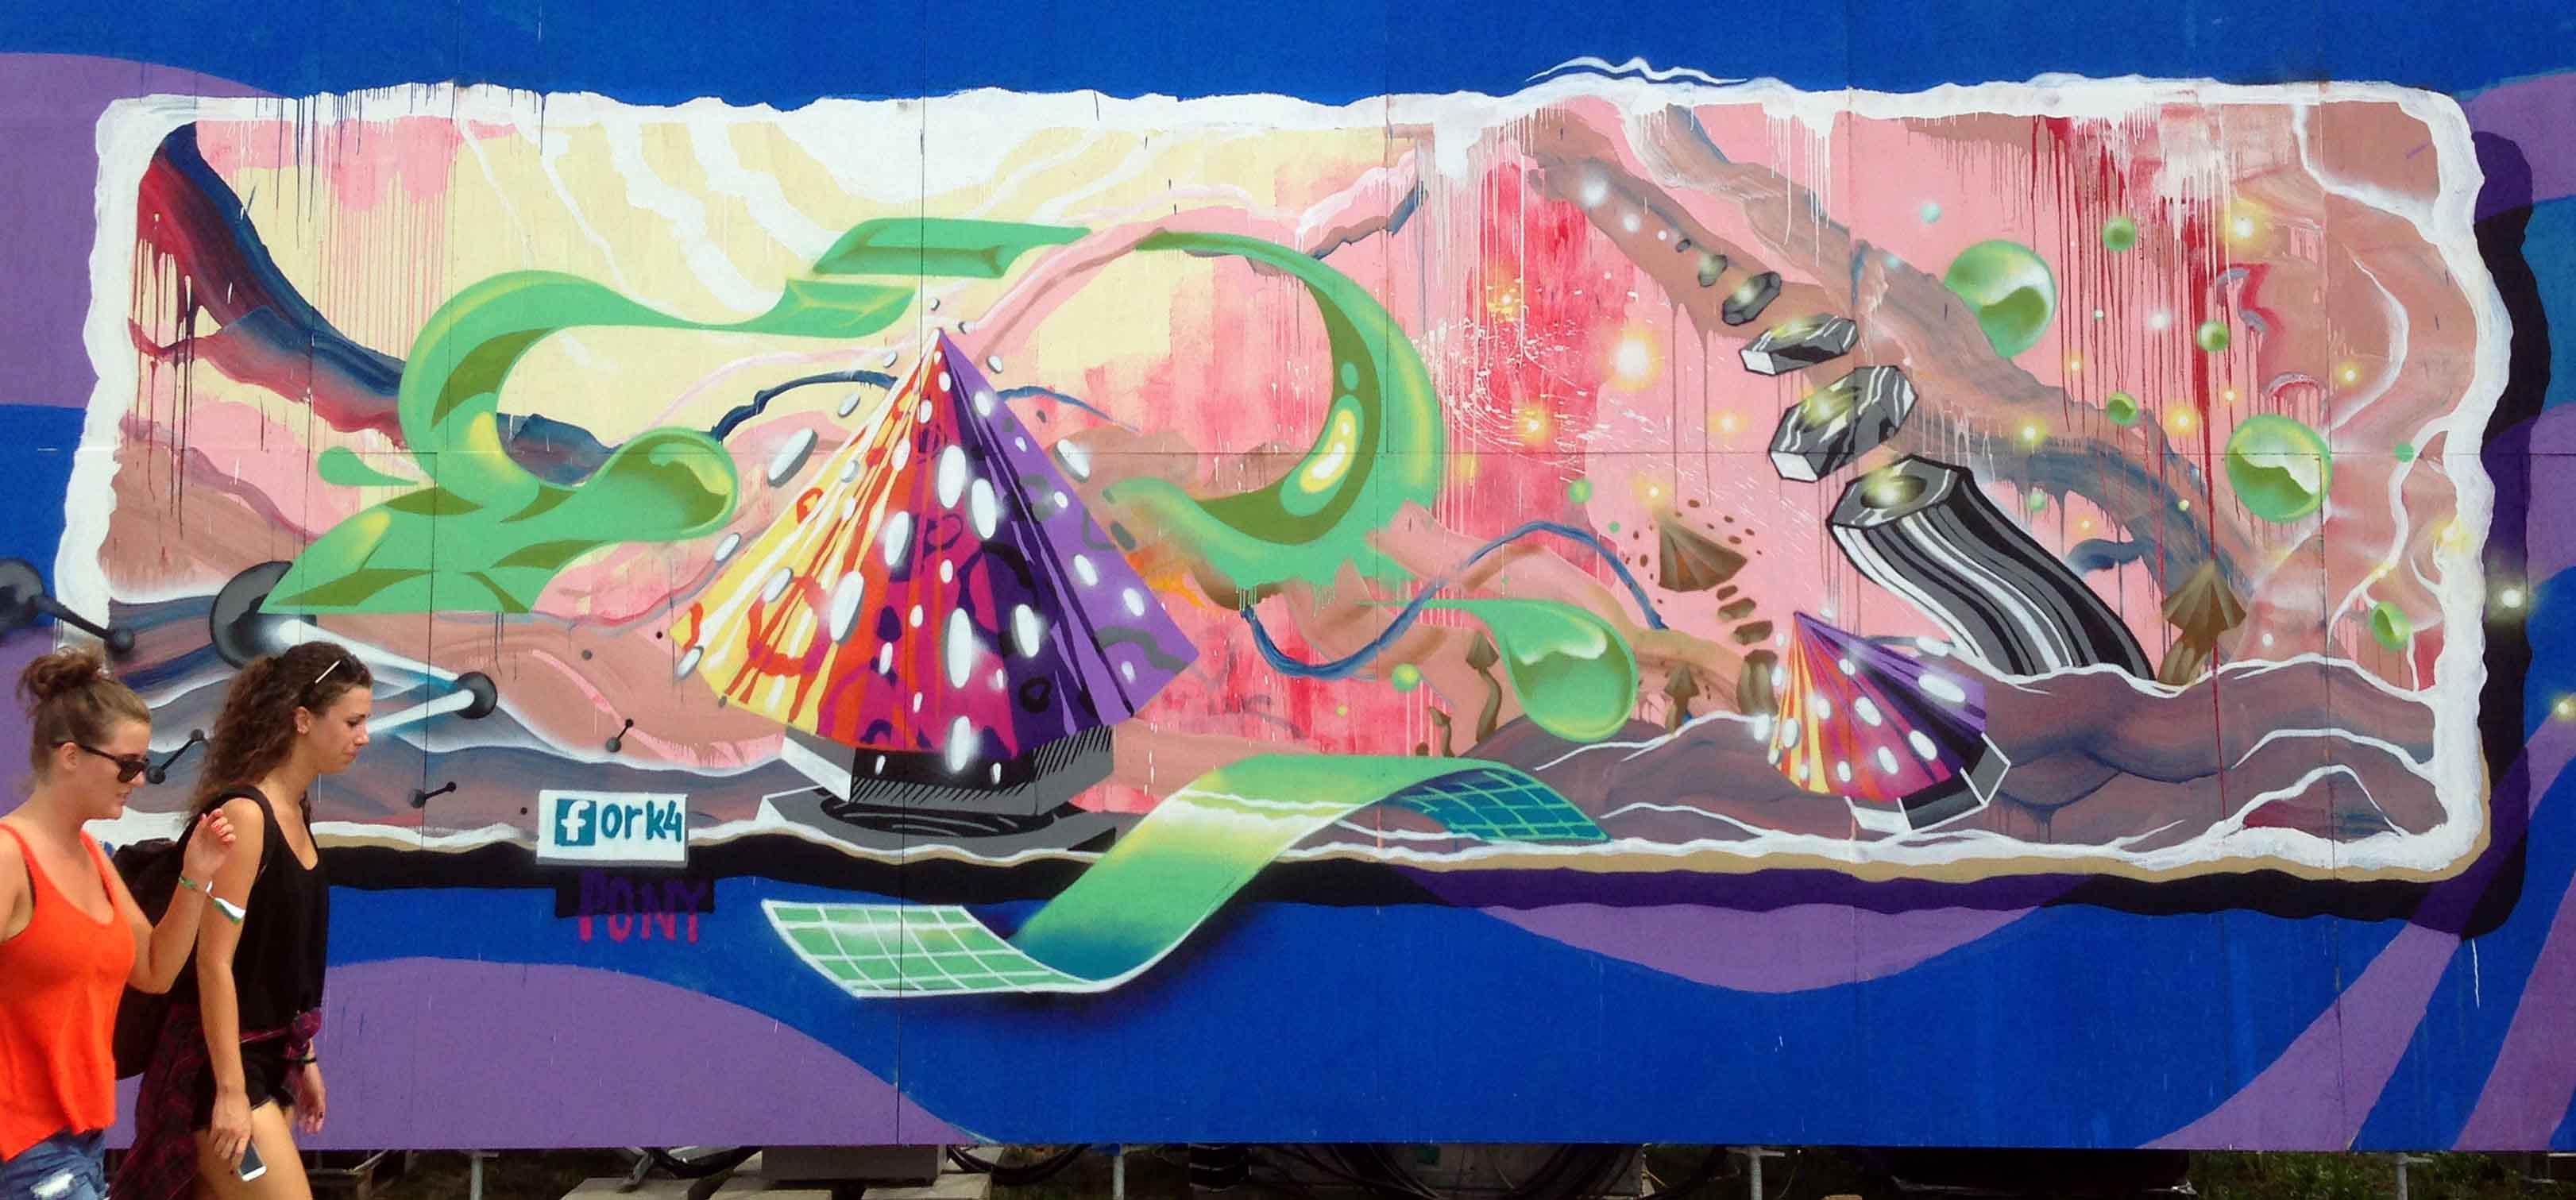 Fork_Szigetfestival_2015